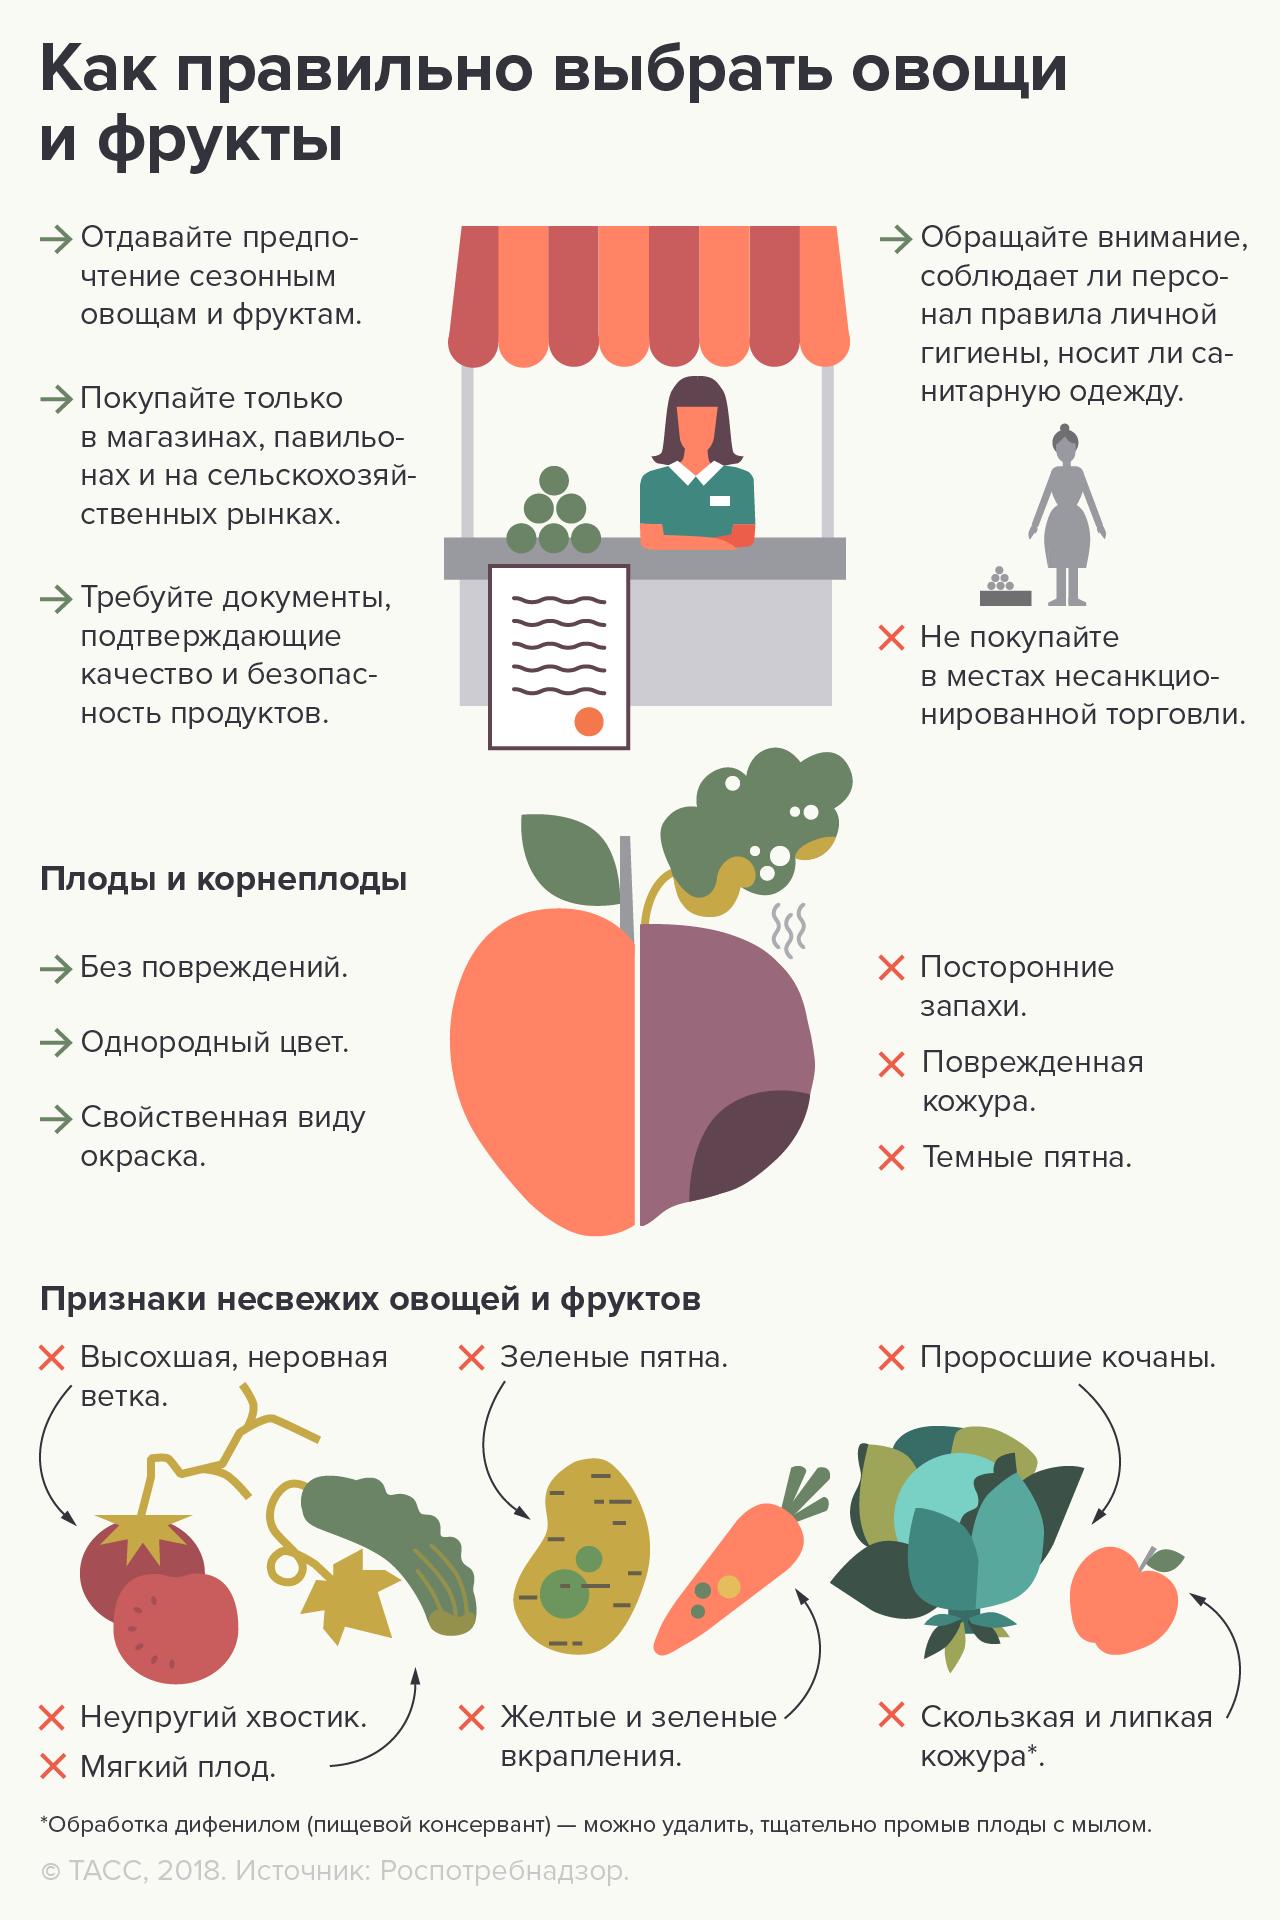 https://www.rospotrebnadzor.ru/files/veg_3.png